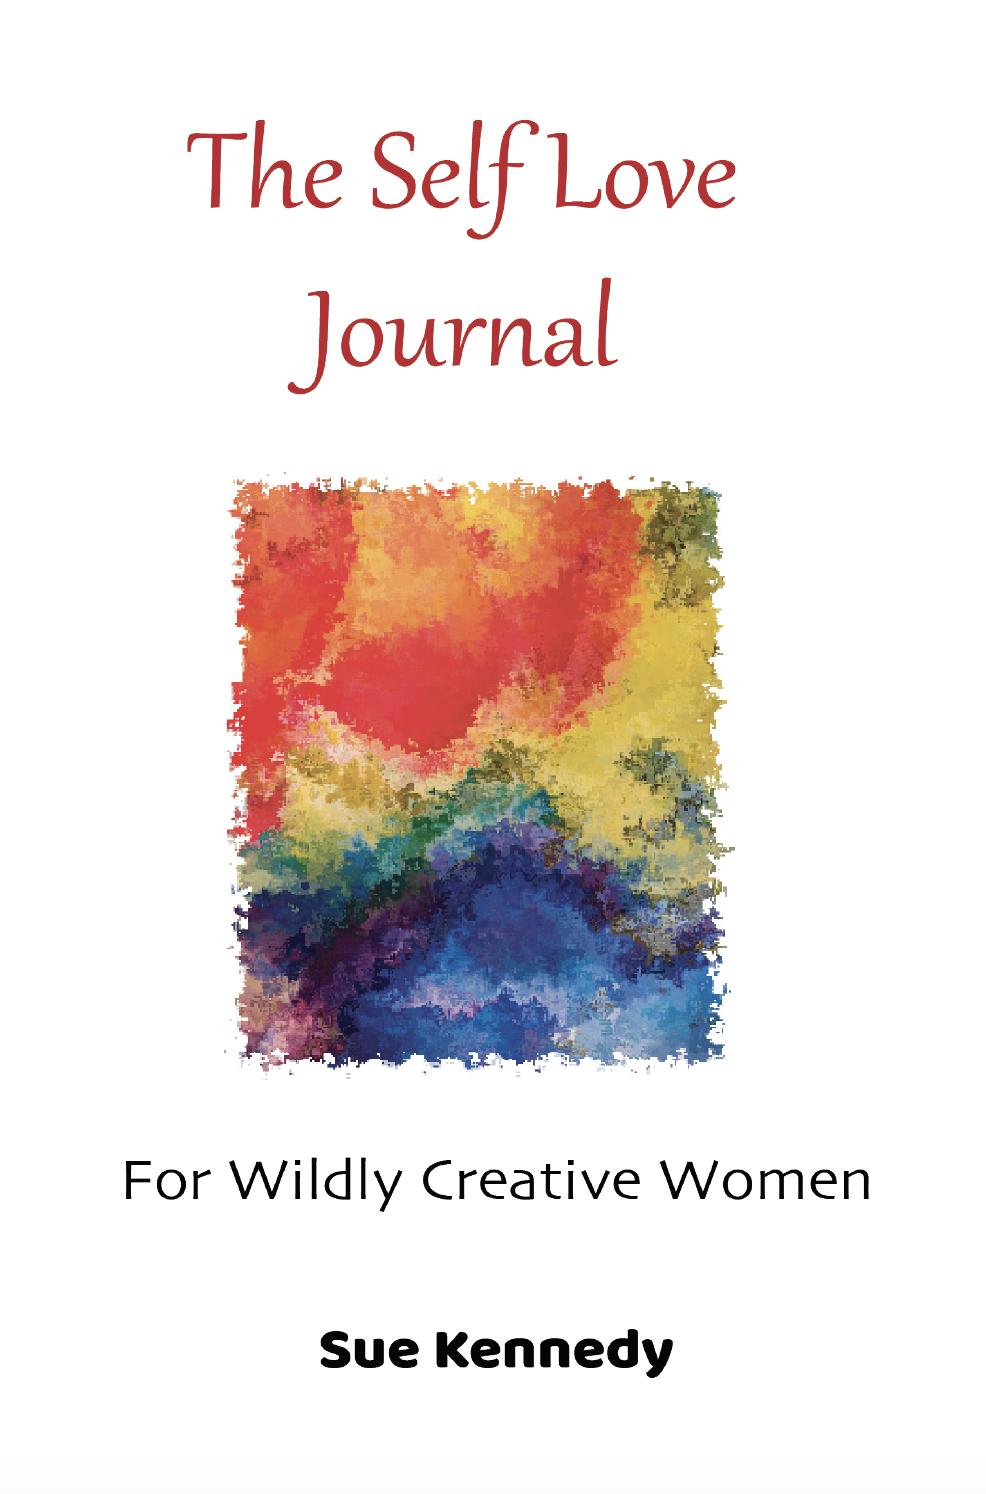 The Self Love Journal